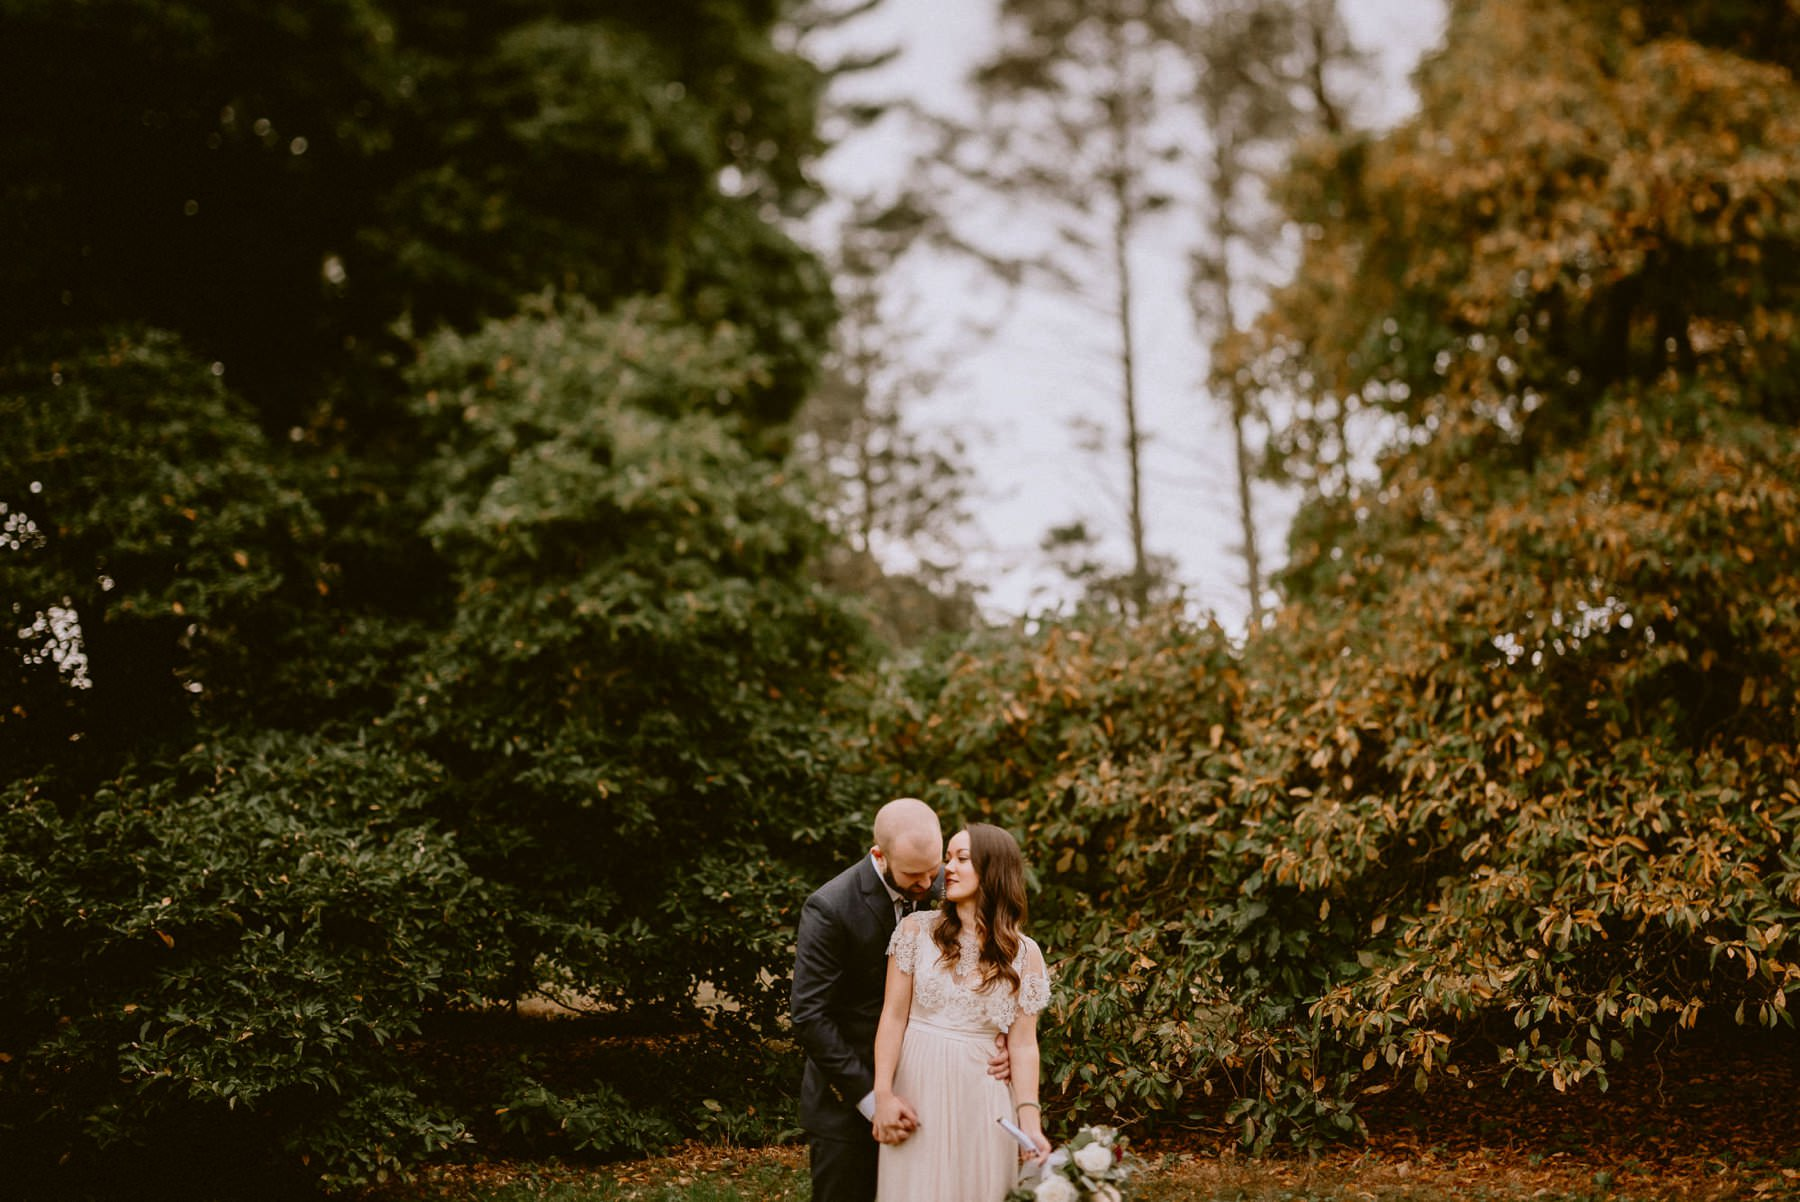 Tyler_arboretum_wedding-046.jpg